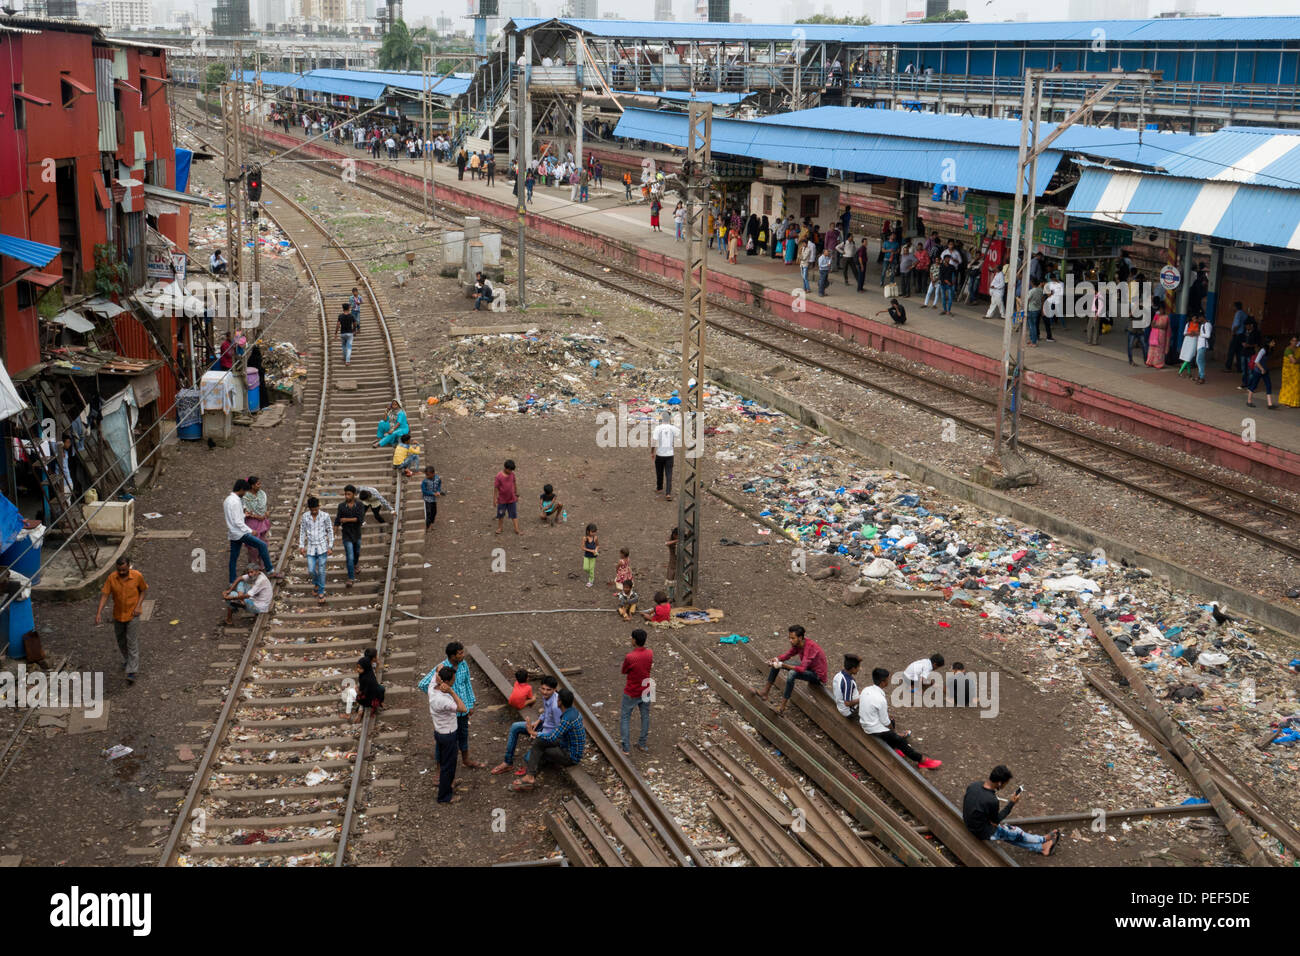 People from slum area with piles of plastic rubbish on tracks next to Bandra train station, Mumbai, Nepal - Stock Image